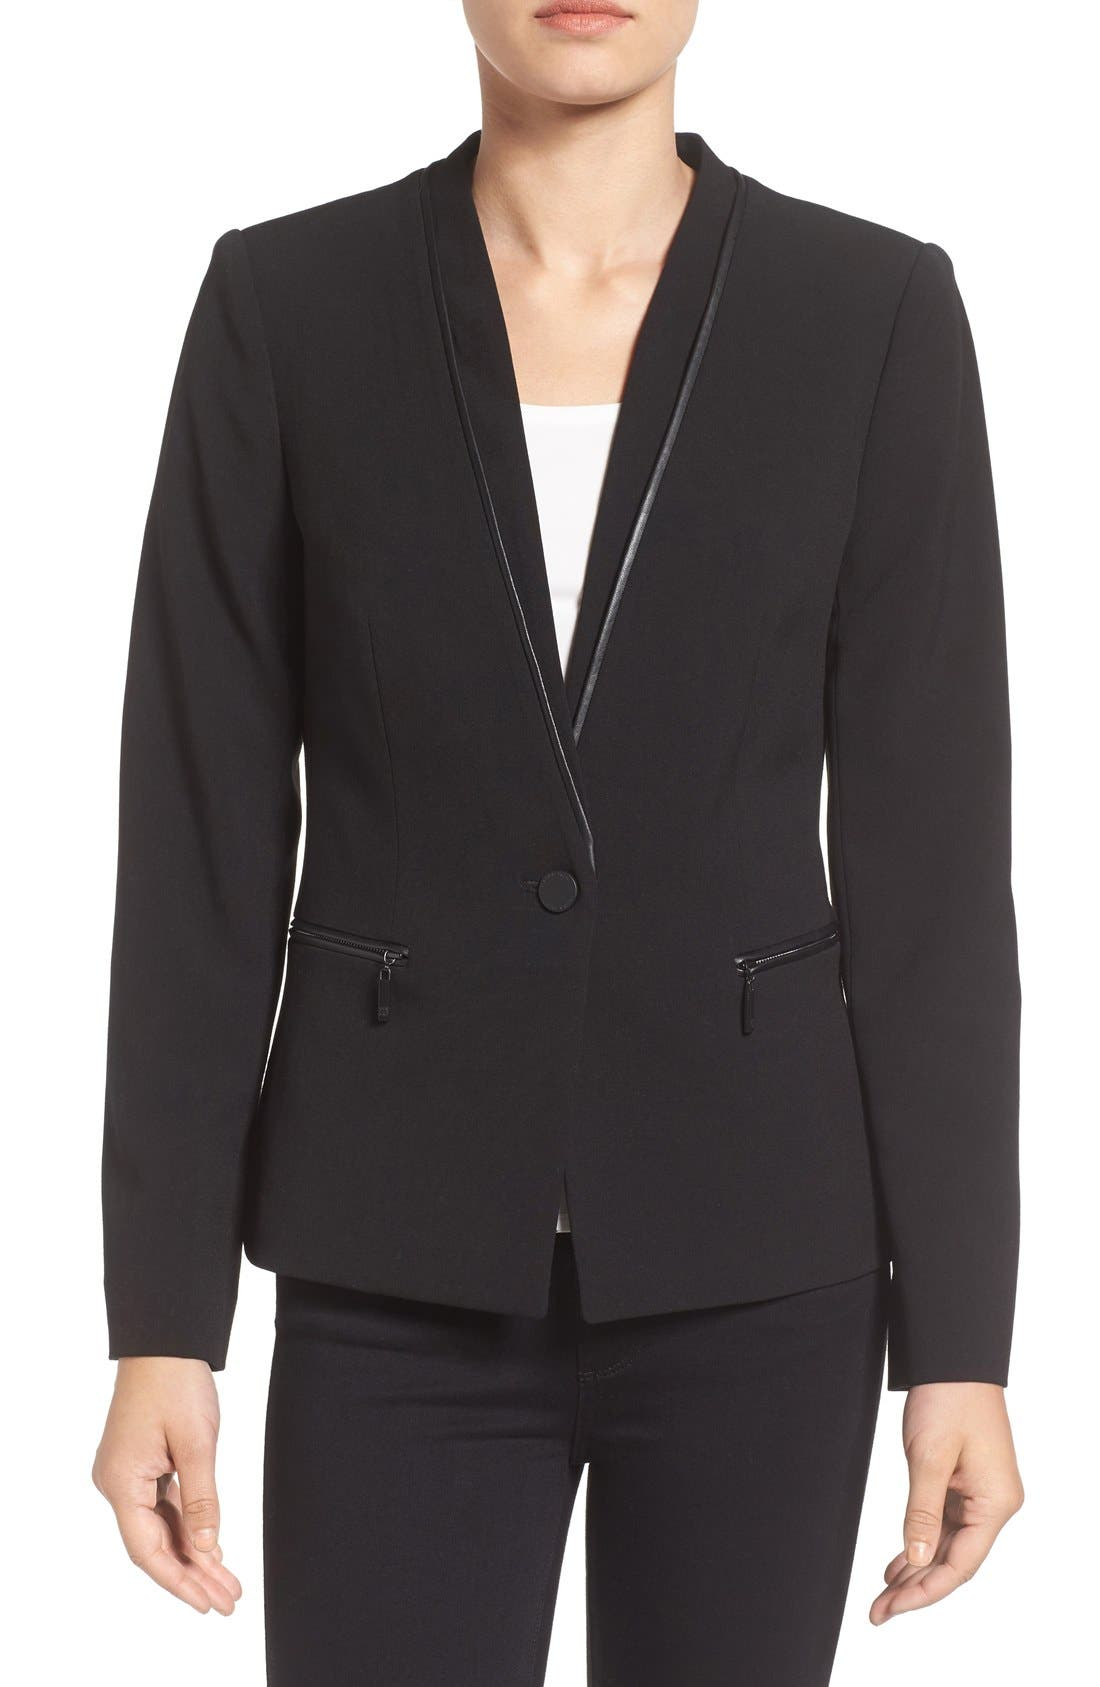 Alternate Image 1 Selected - Ivanka Trump Faux Leather Trim Suit Jacket